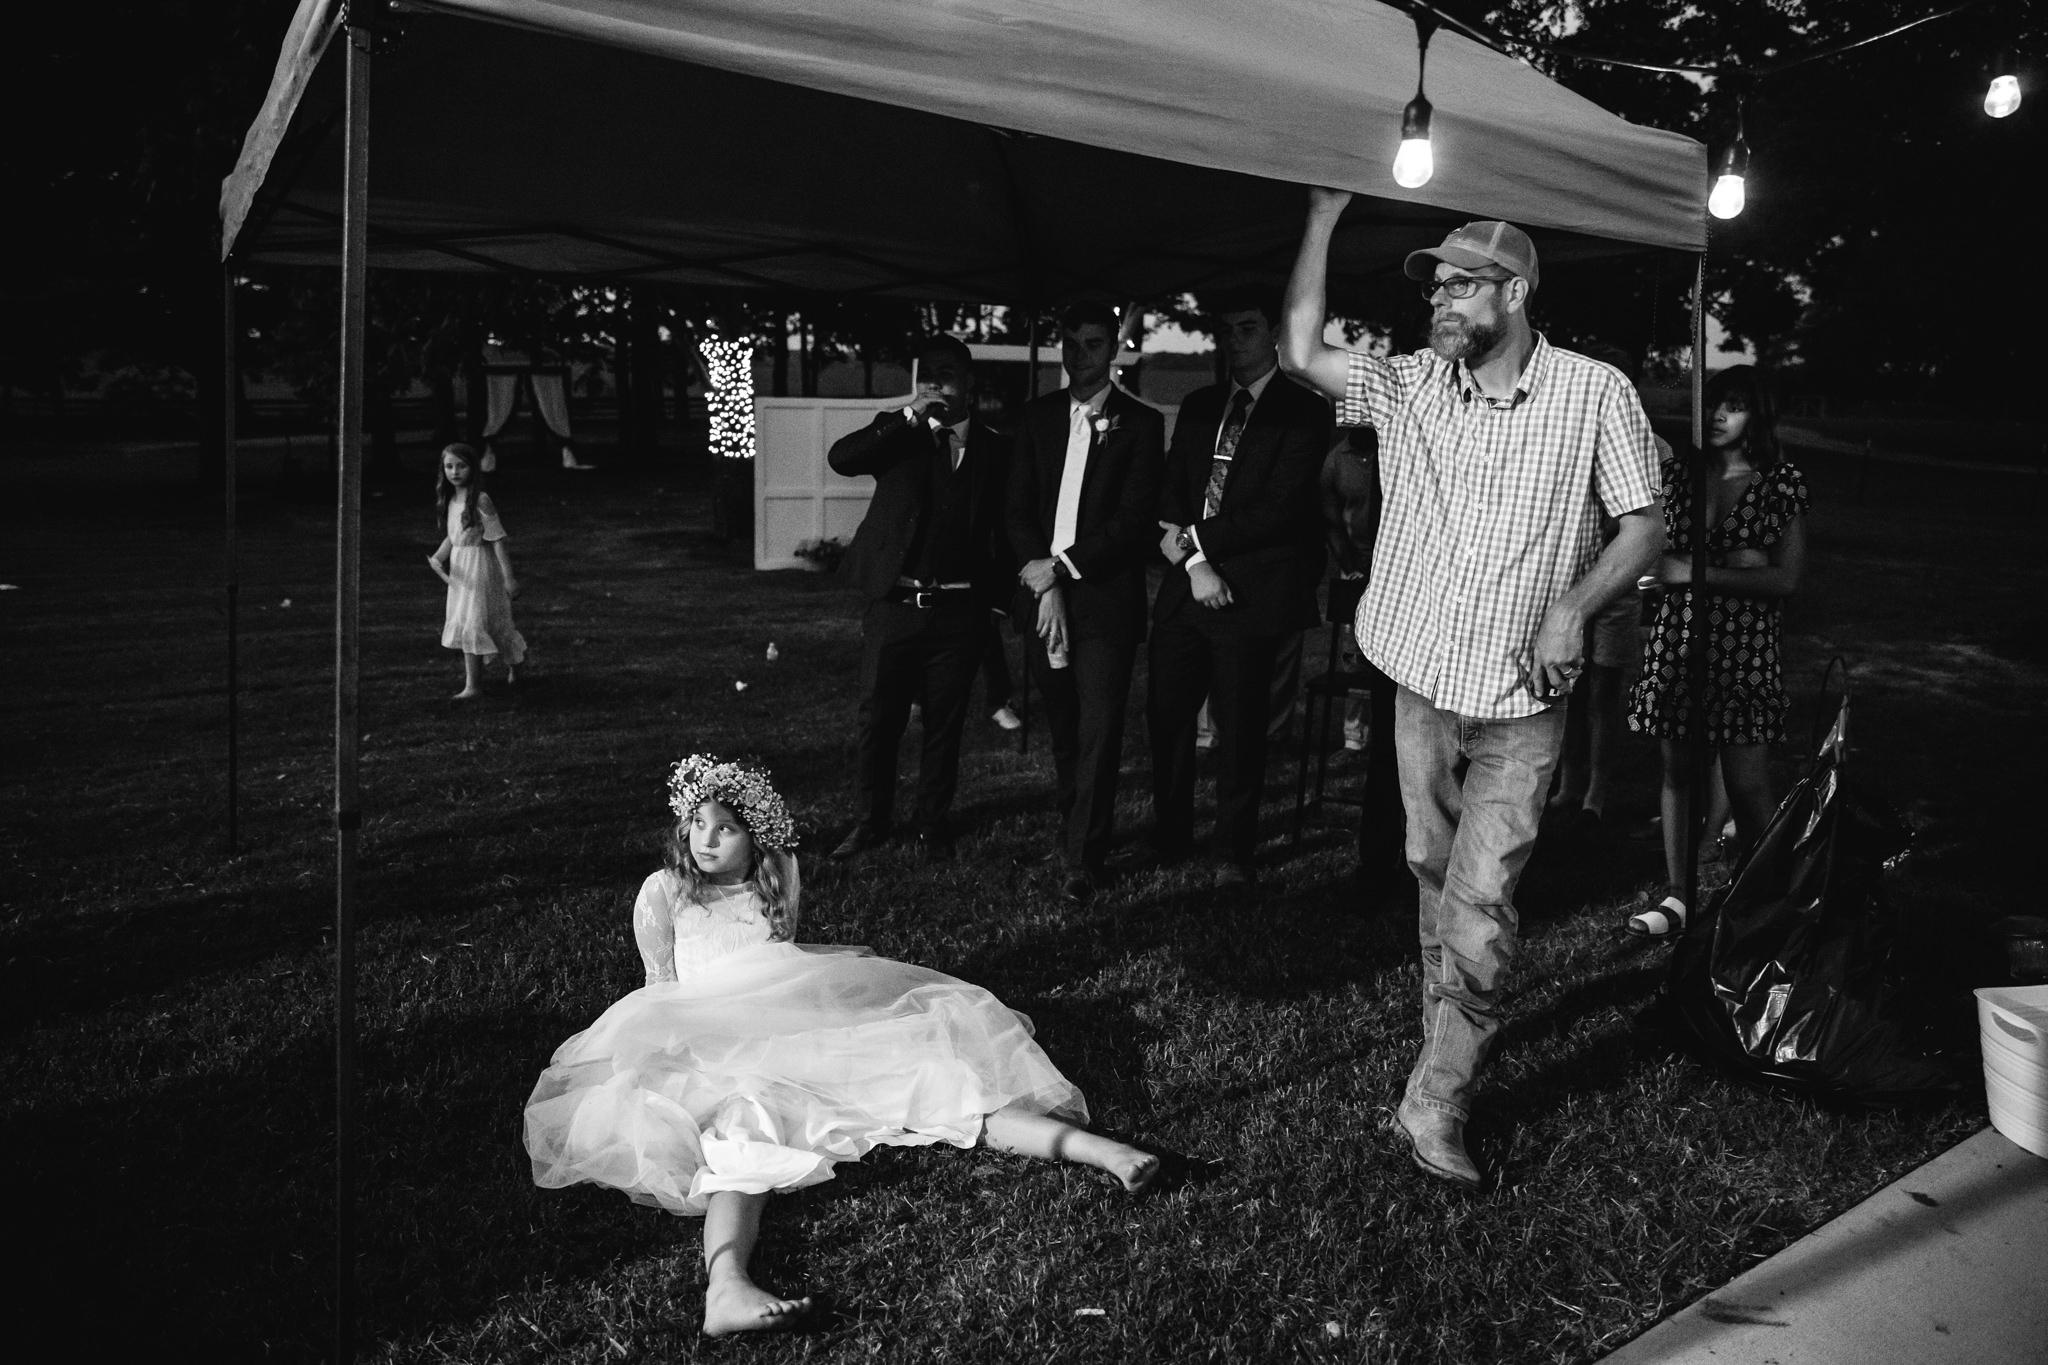 backyard-wedding-thewarmtharoundyou-lexy-branson-45.jpg